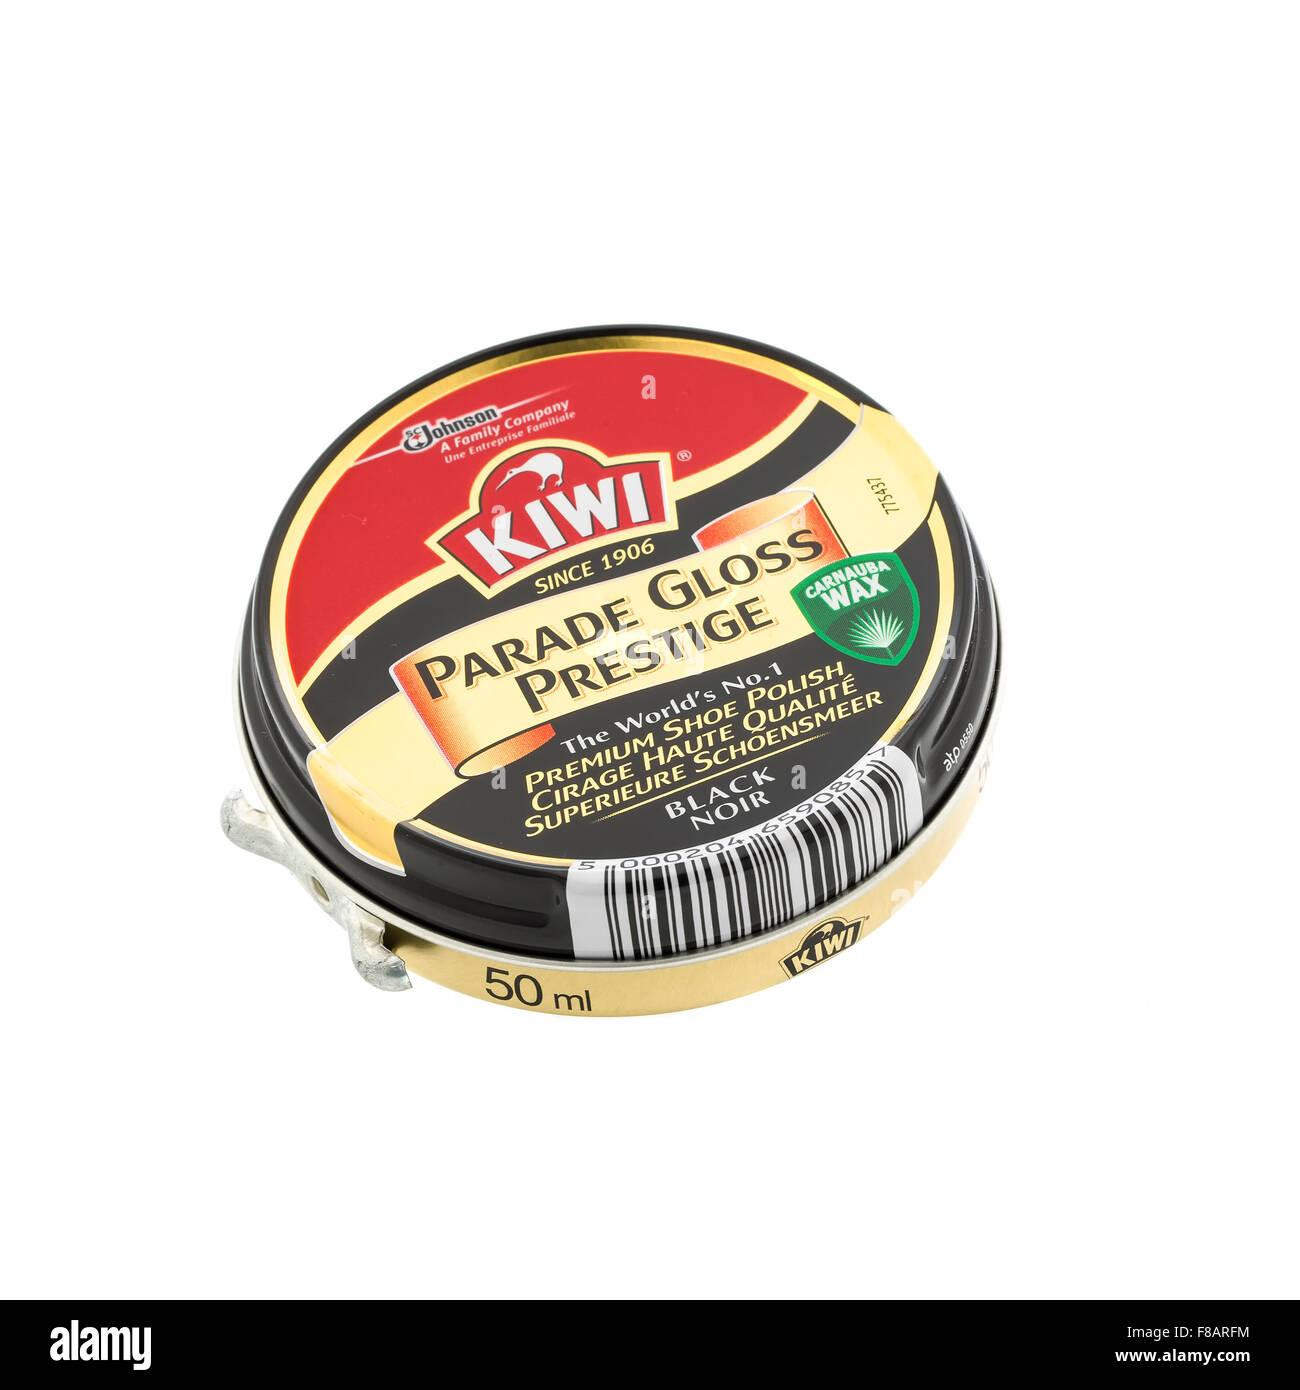 Tin Of Kiwi Black Parade Gloss Prestige Shoe Polish on a White Background - Stock Image